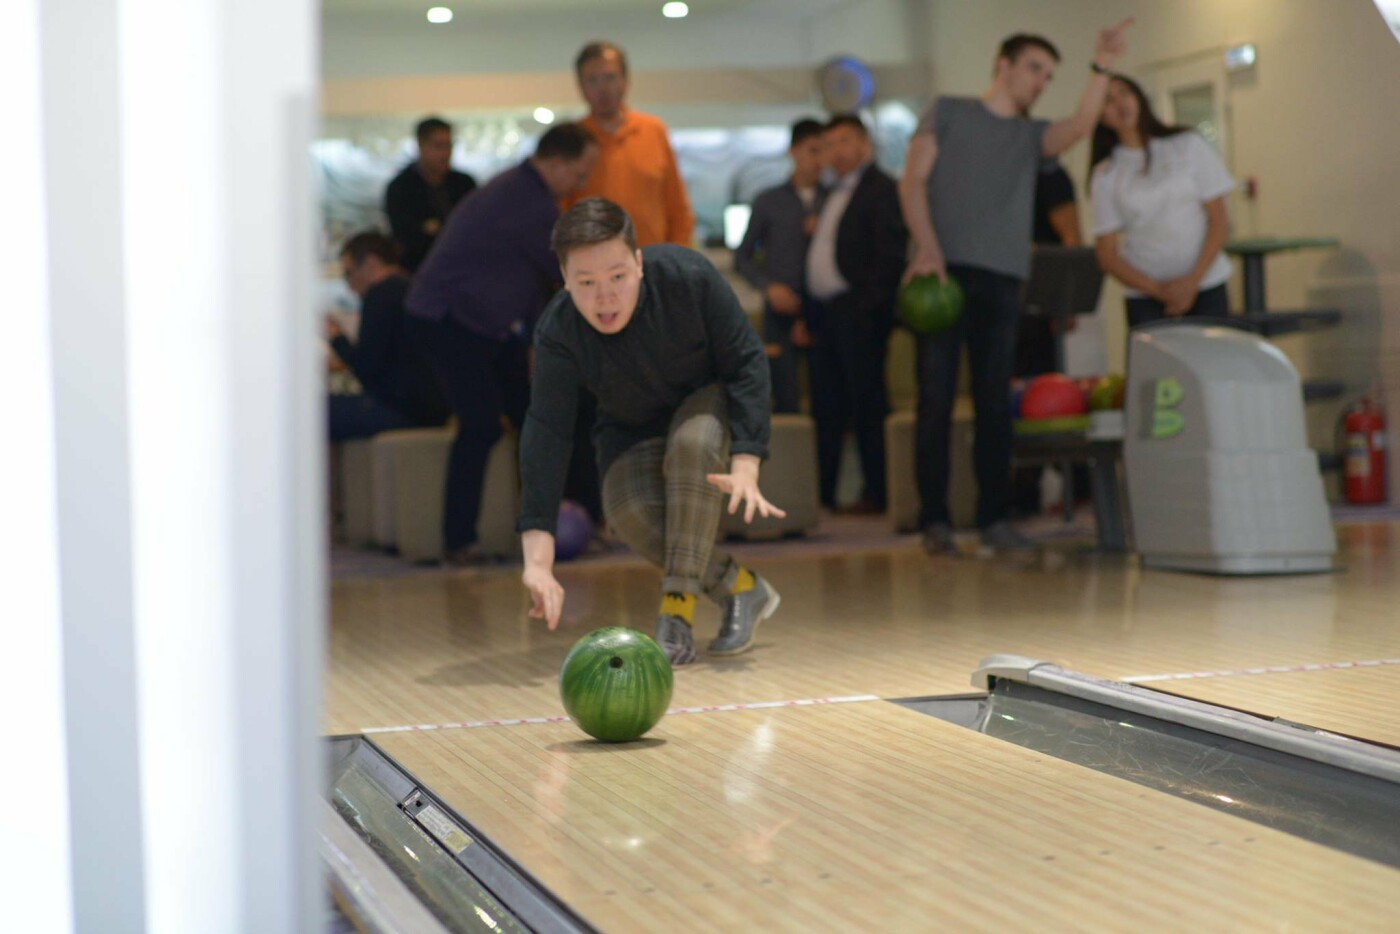 II турнир по боулингу среди журналистов прошел в Алматы (ФОТО), фото-12